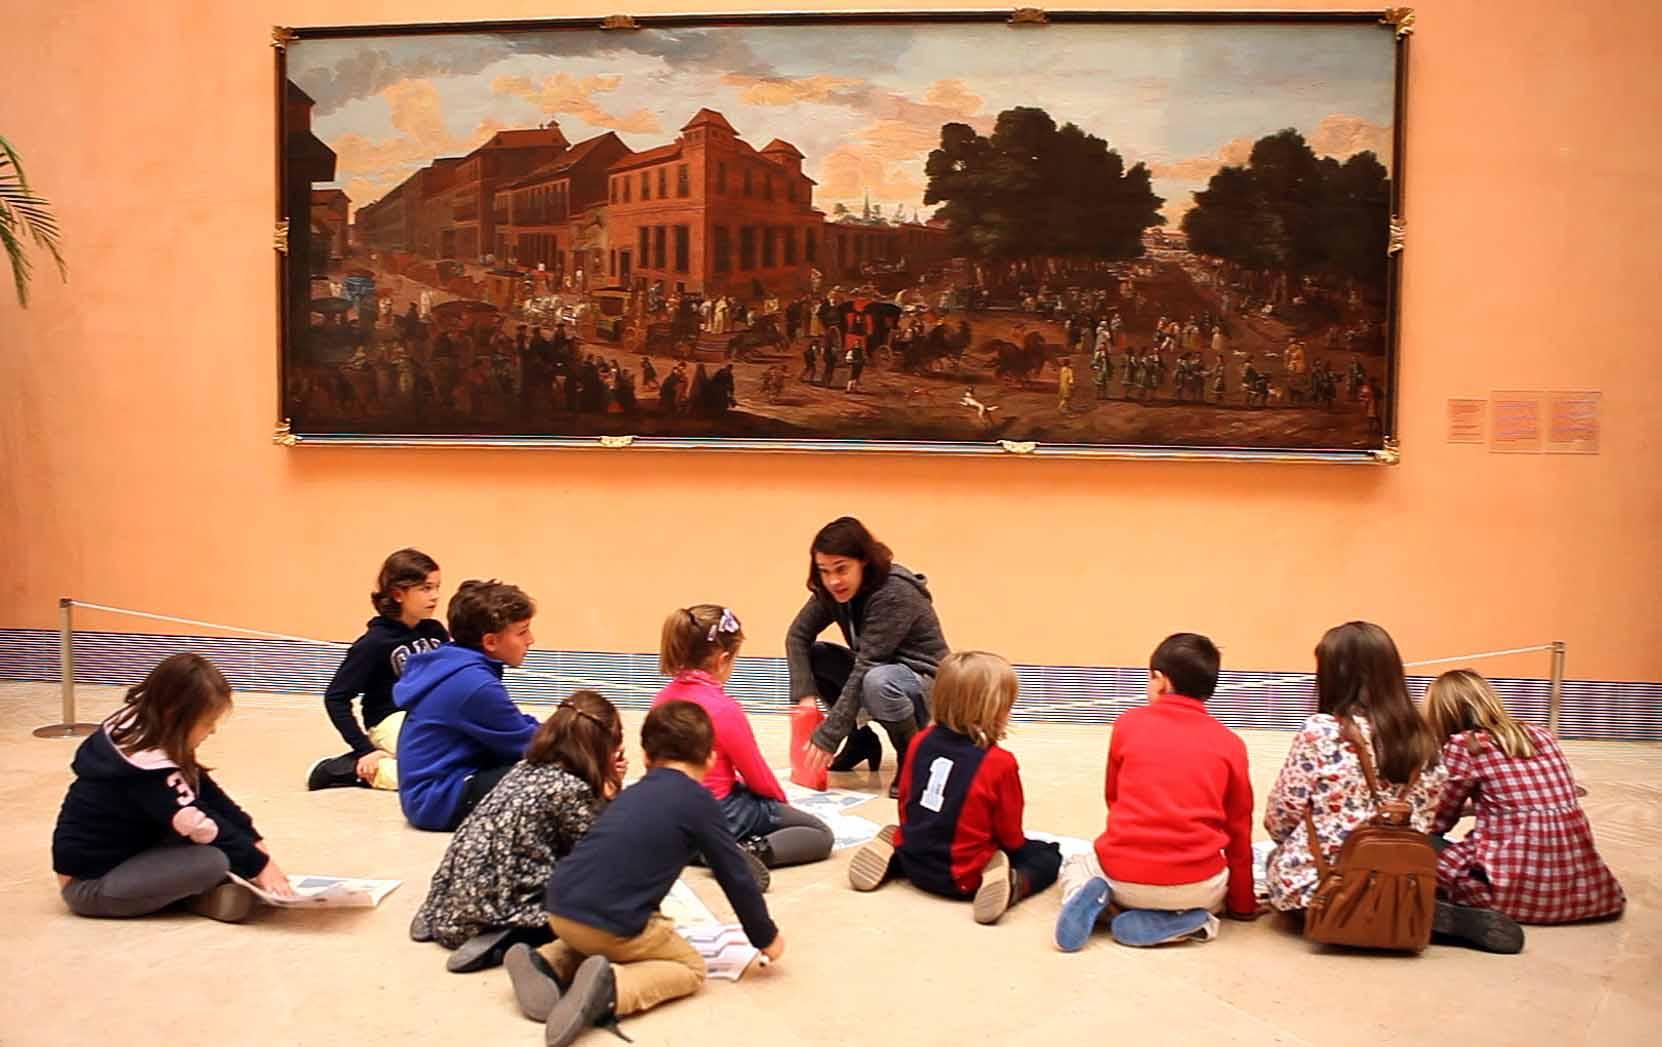 Family Thyssen: Nueva actividad del Museo Thyssen-Bornemisza